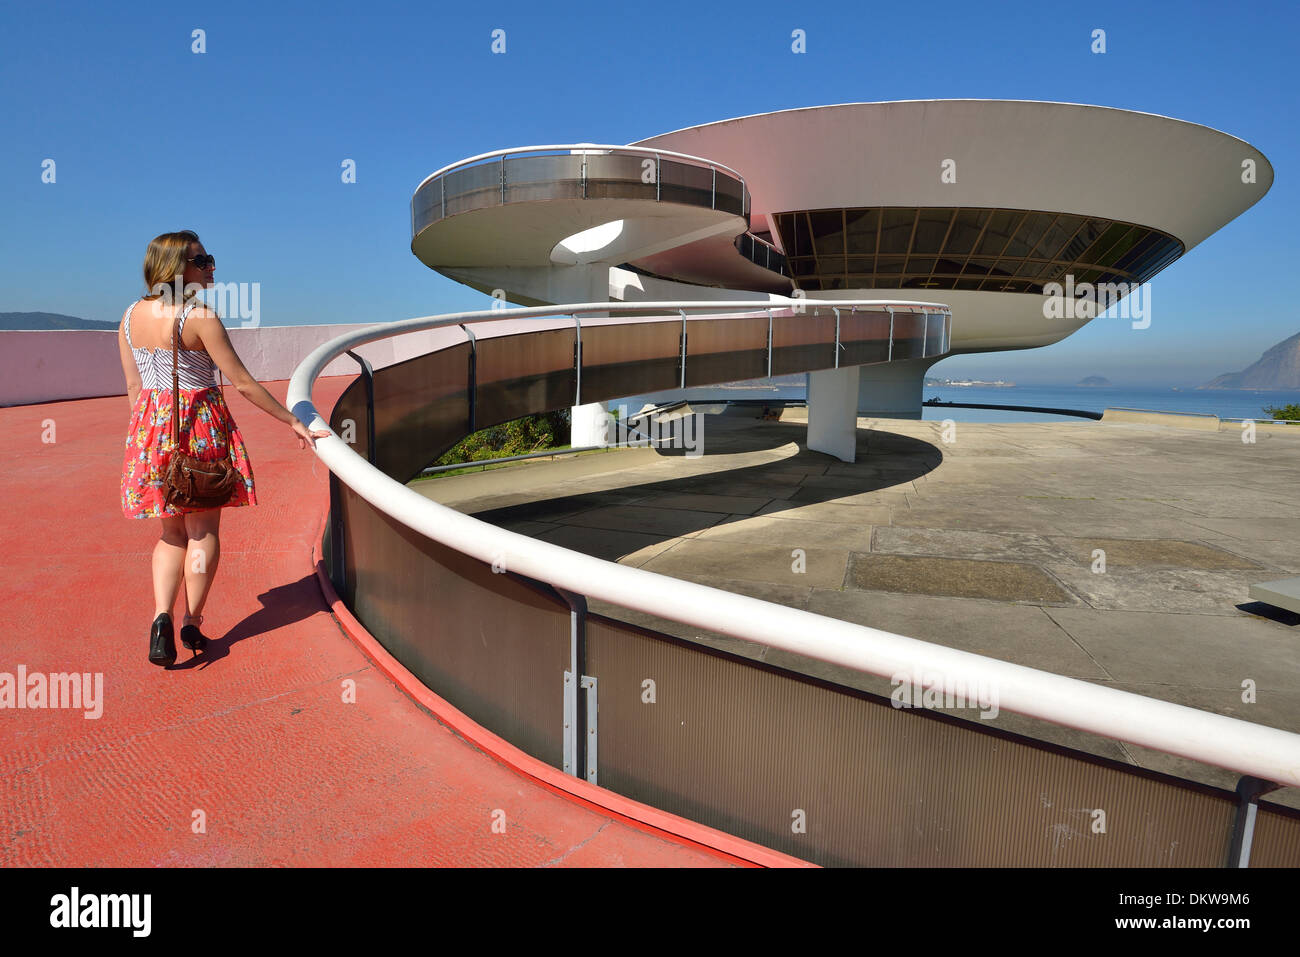 America del Sud America Latina Brasile Rio Rio de Janeiro città MAC Rio Niteroi Oscar Niemeyer Baia de Guanabara calcestruzzo Immagini Stock